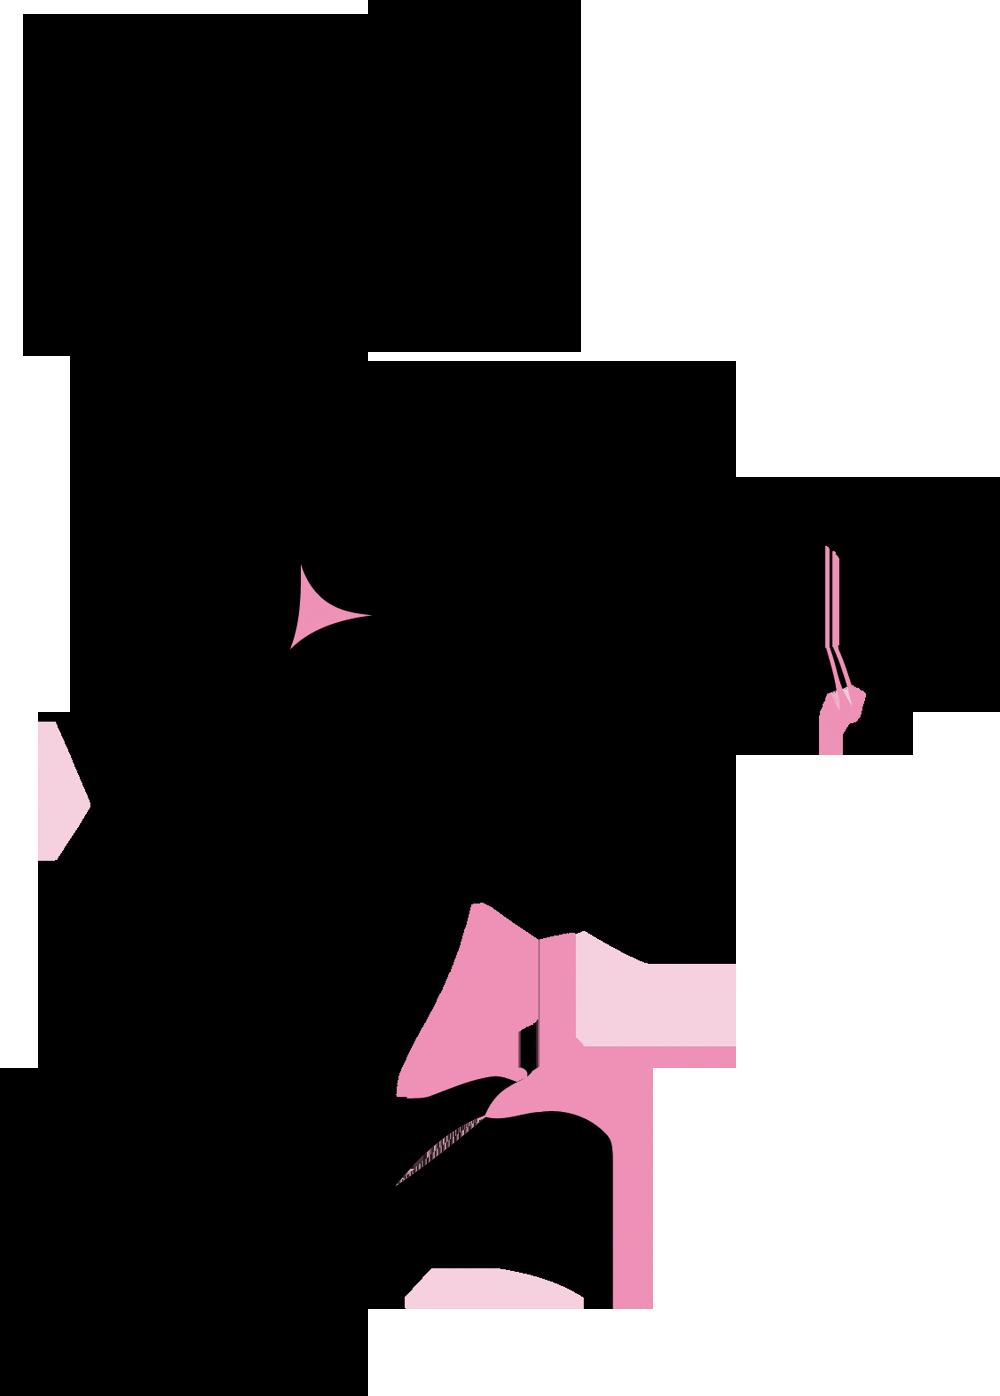 graduate silhouette clipart - HD1000×1396